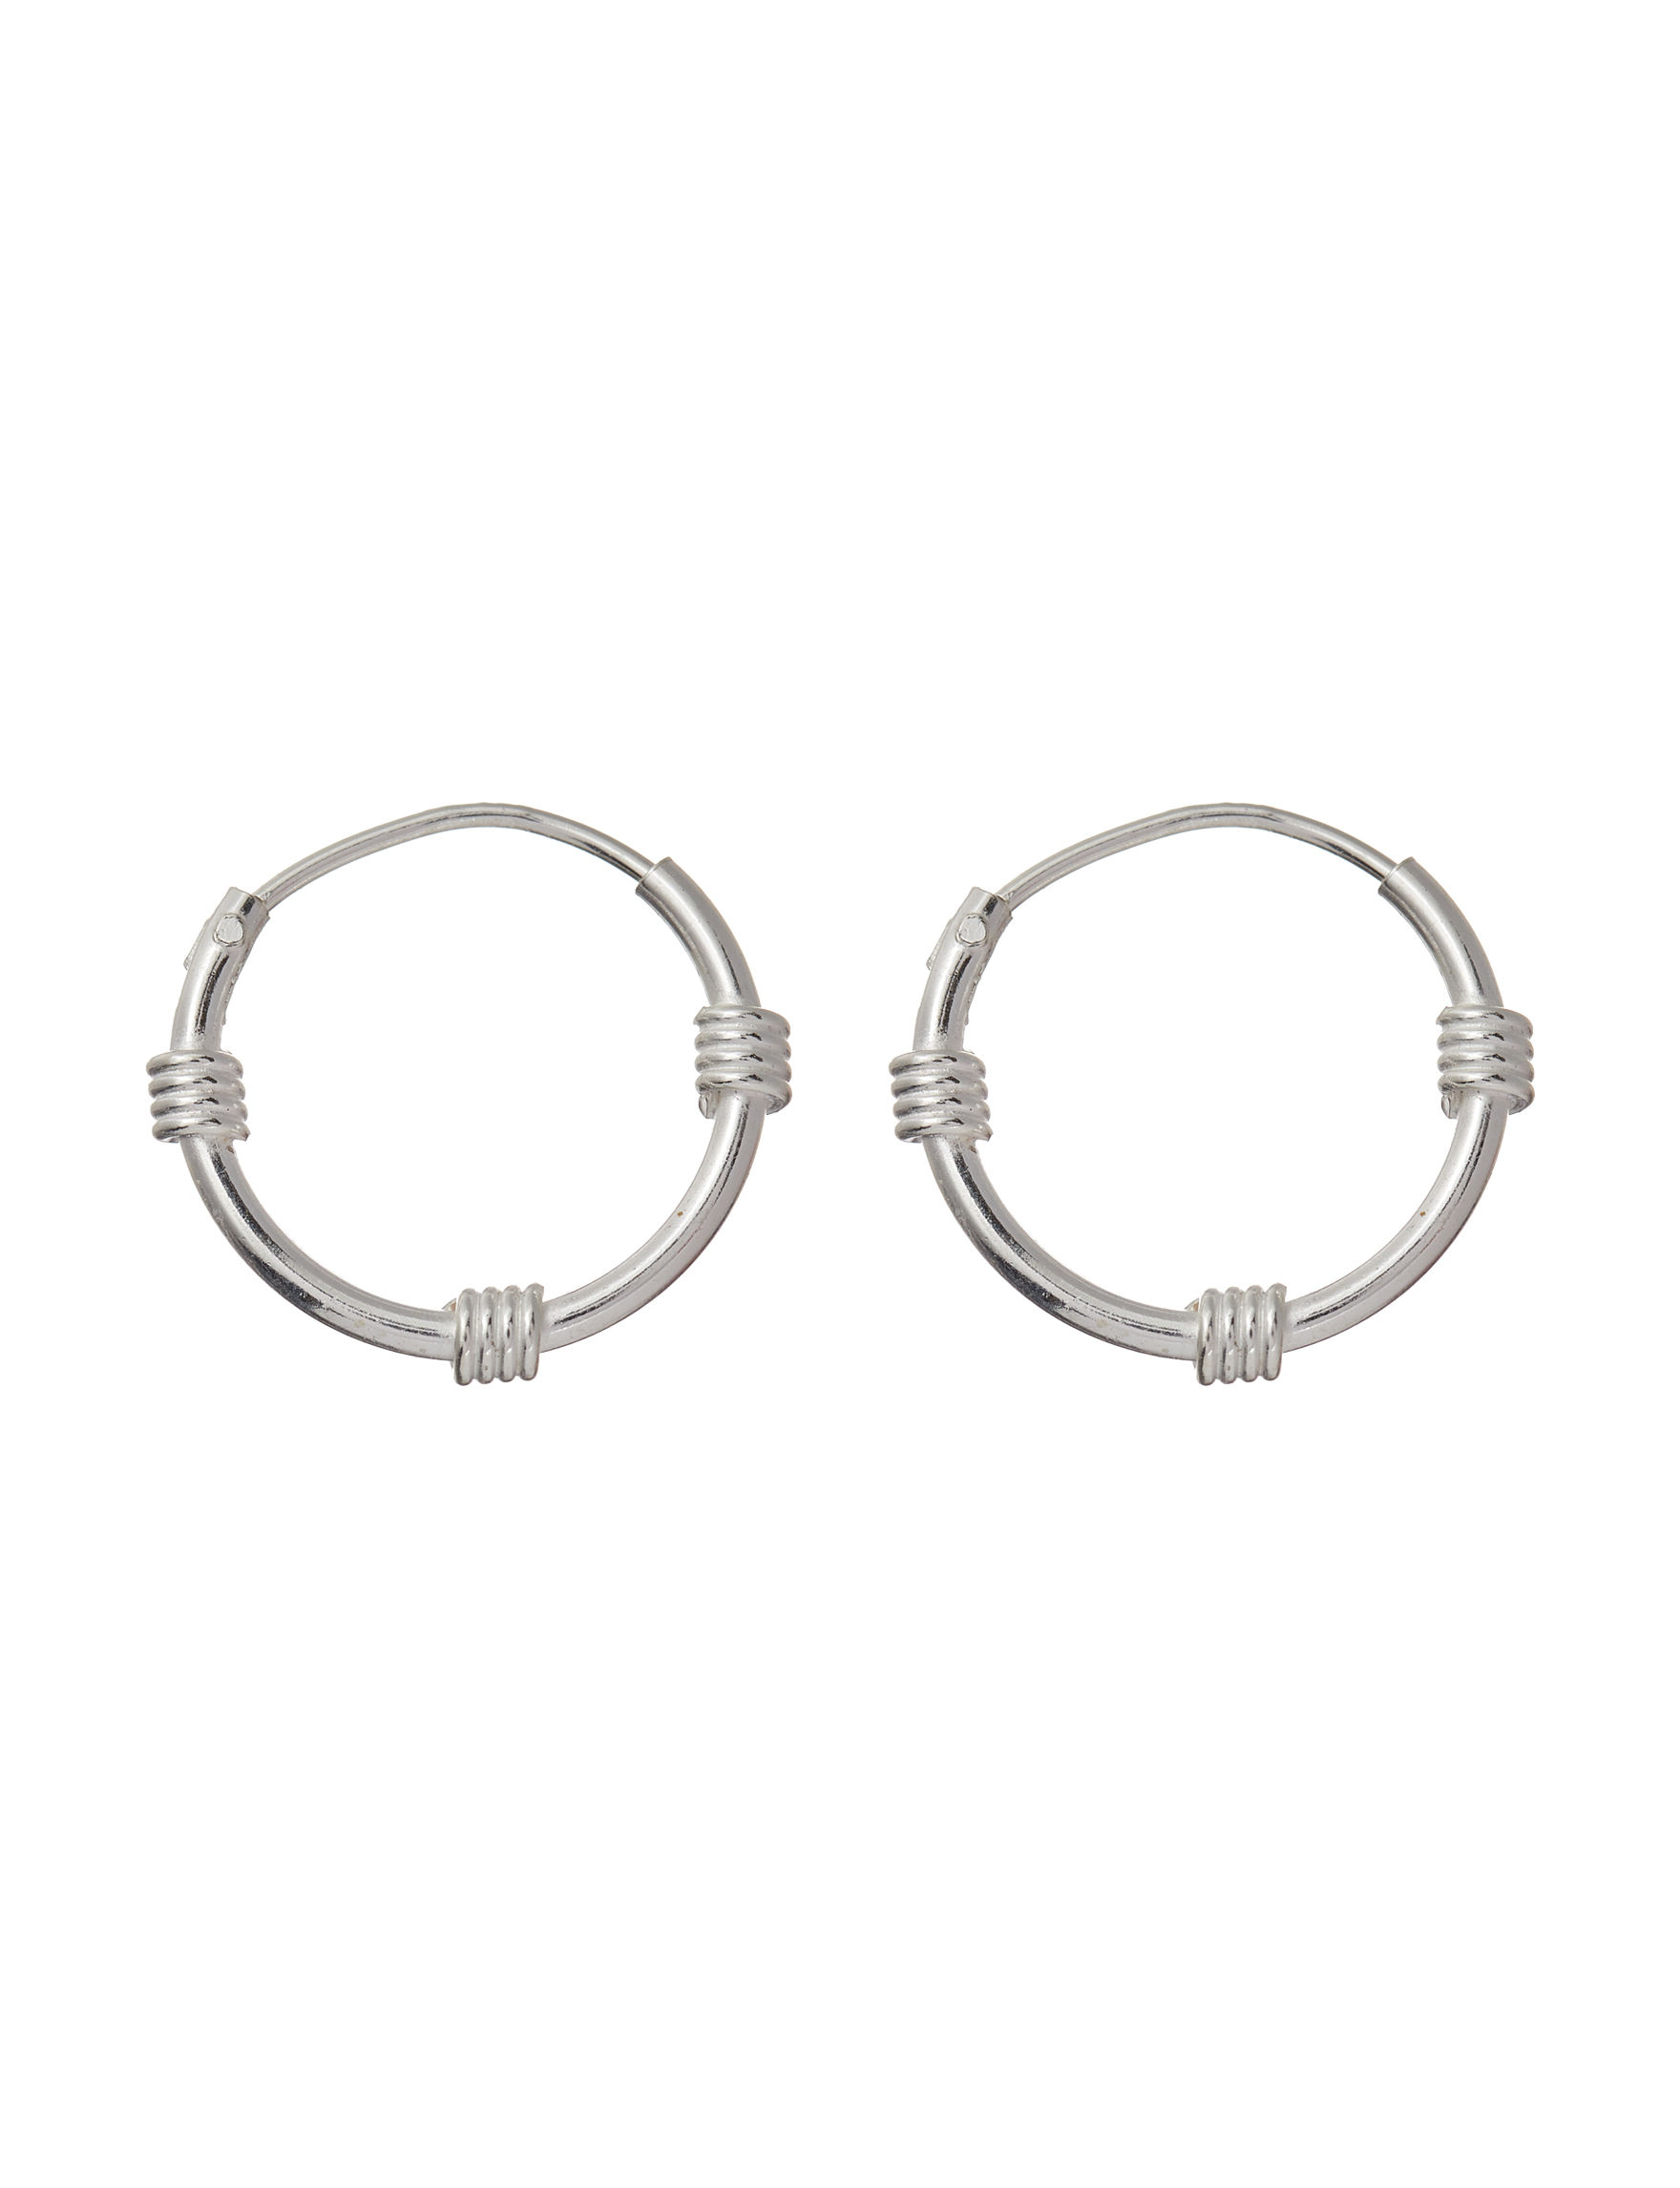 3749b12b3 Sterling Silver 14mm Bali Style Endless Hoop Earrings | Stage Stores